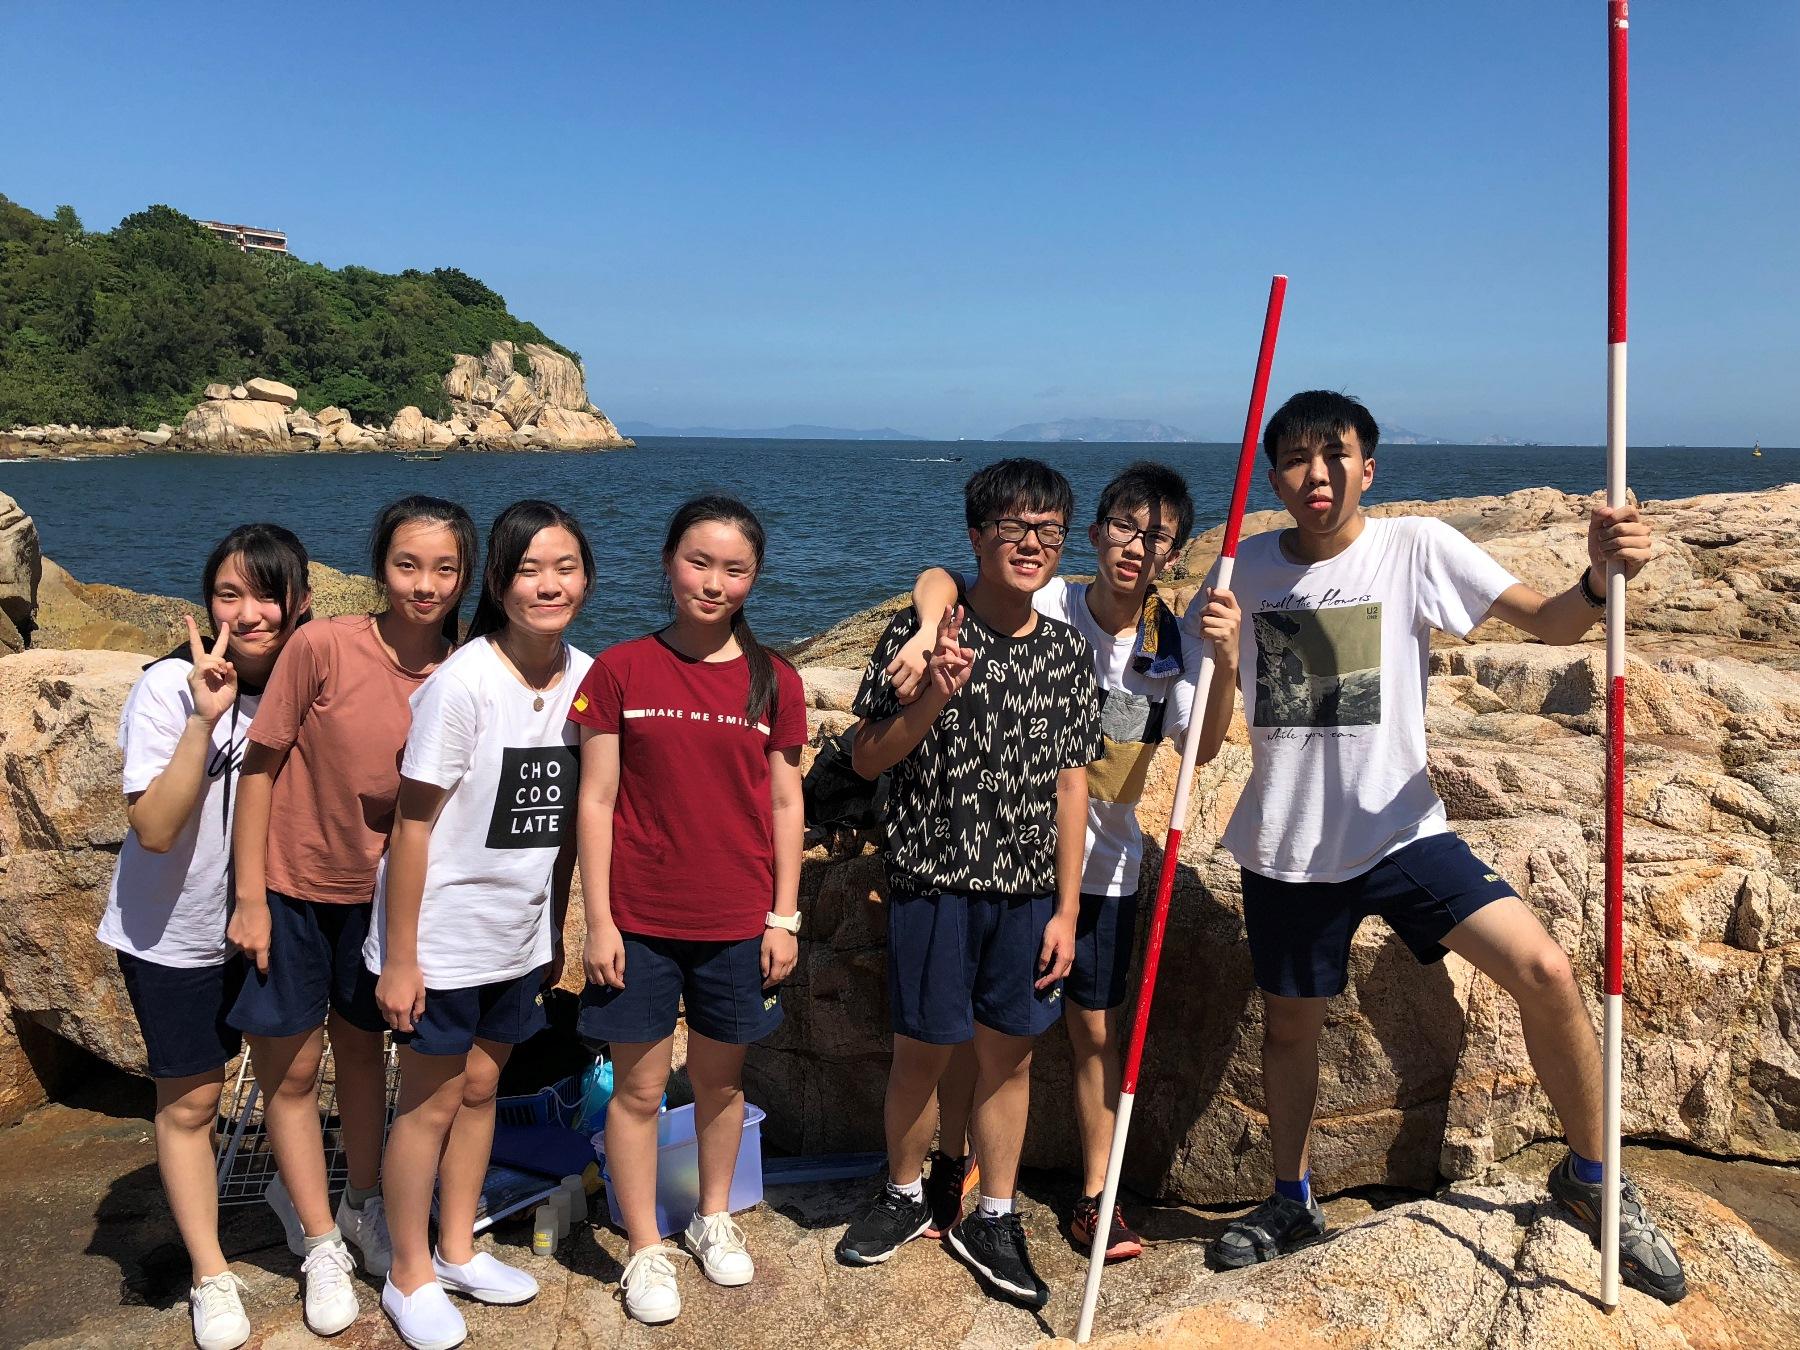 http://www.npc.edu.hk/sites/default/files/12_153.jpg